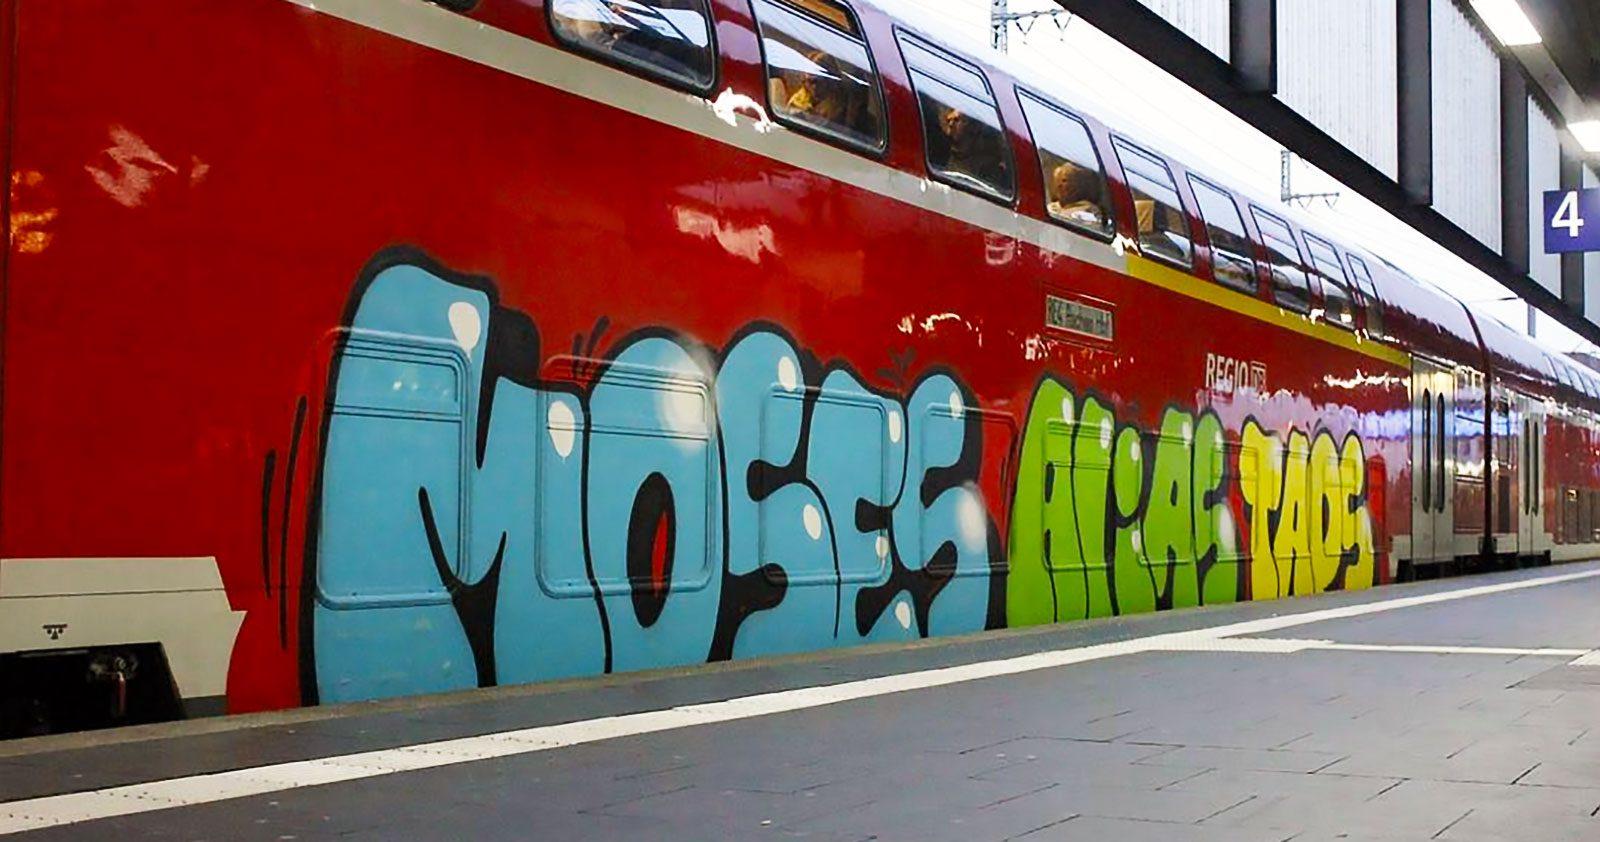 Moses Alias Taps: un alias n'est plus une preuve